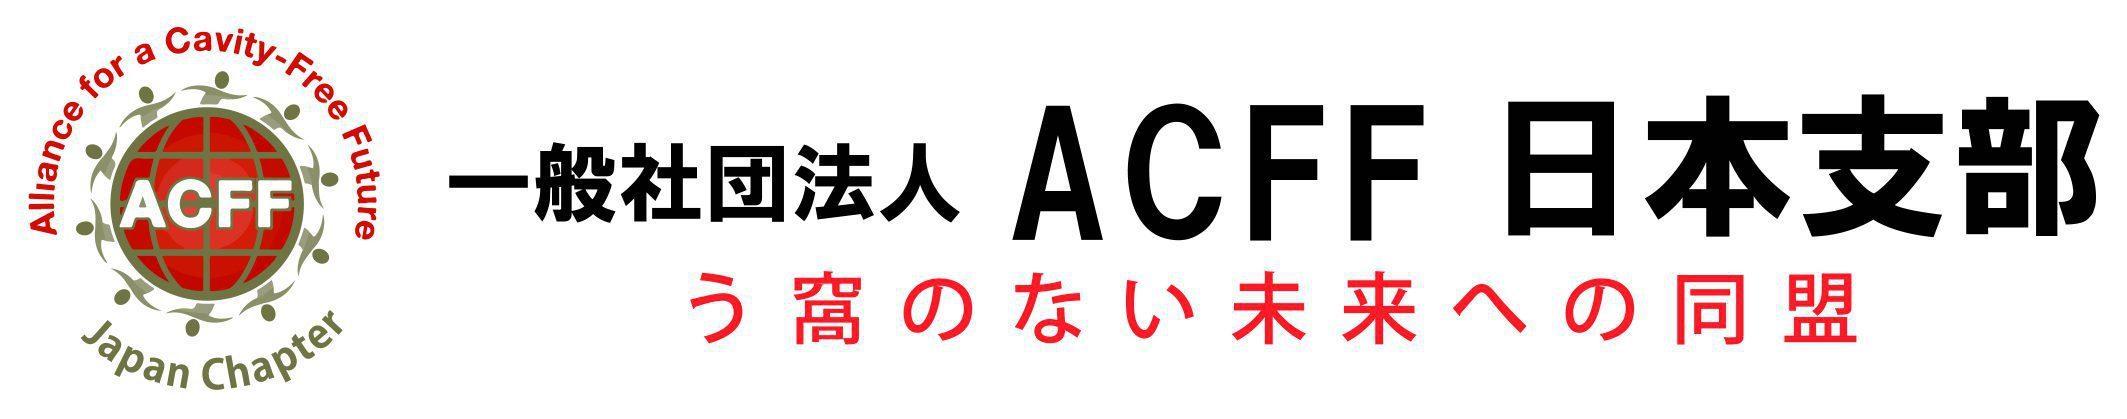 ACFF日本支部 acffjapan